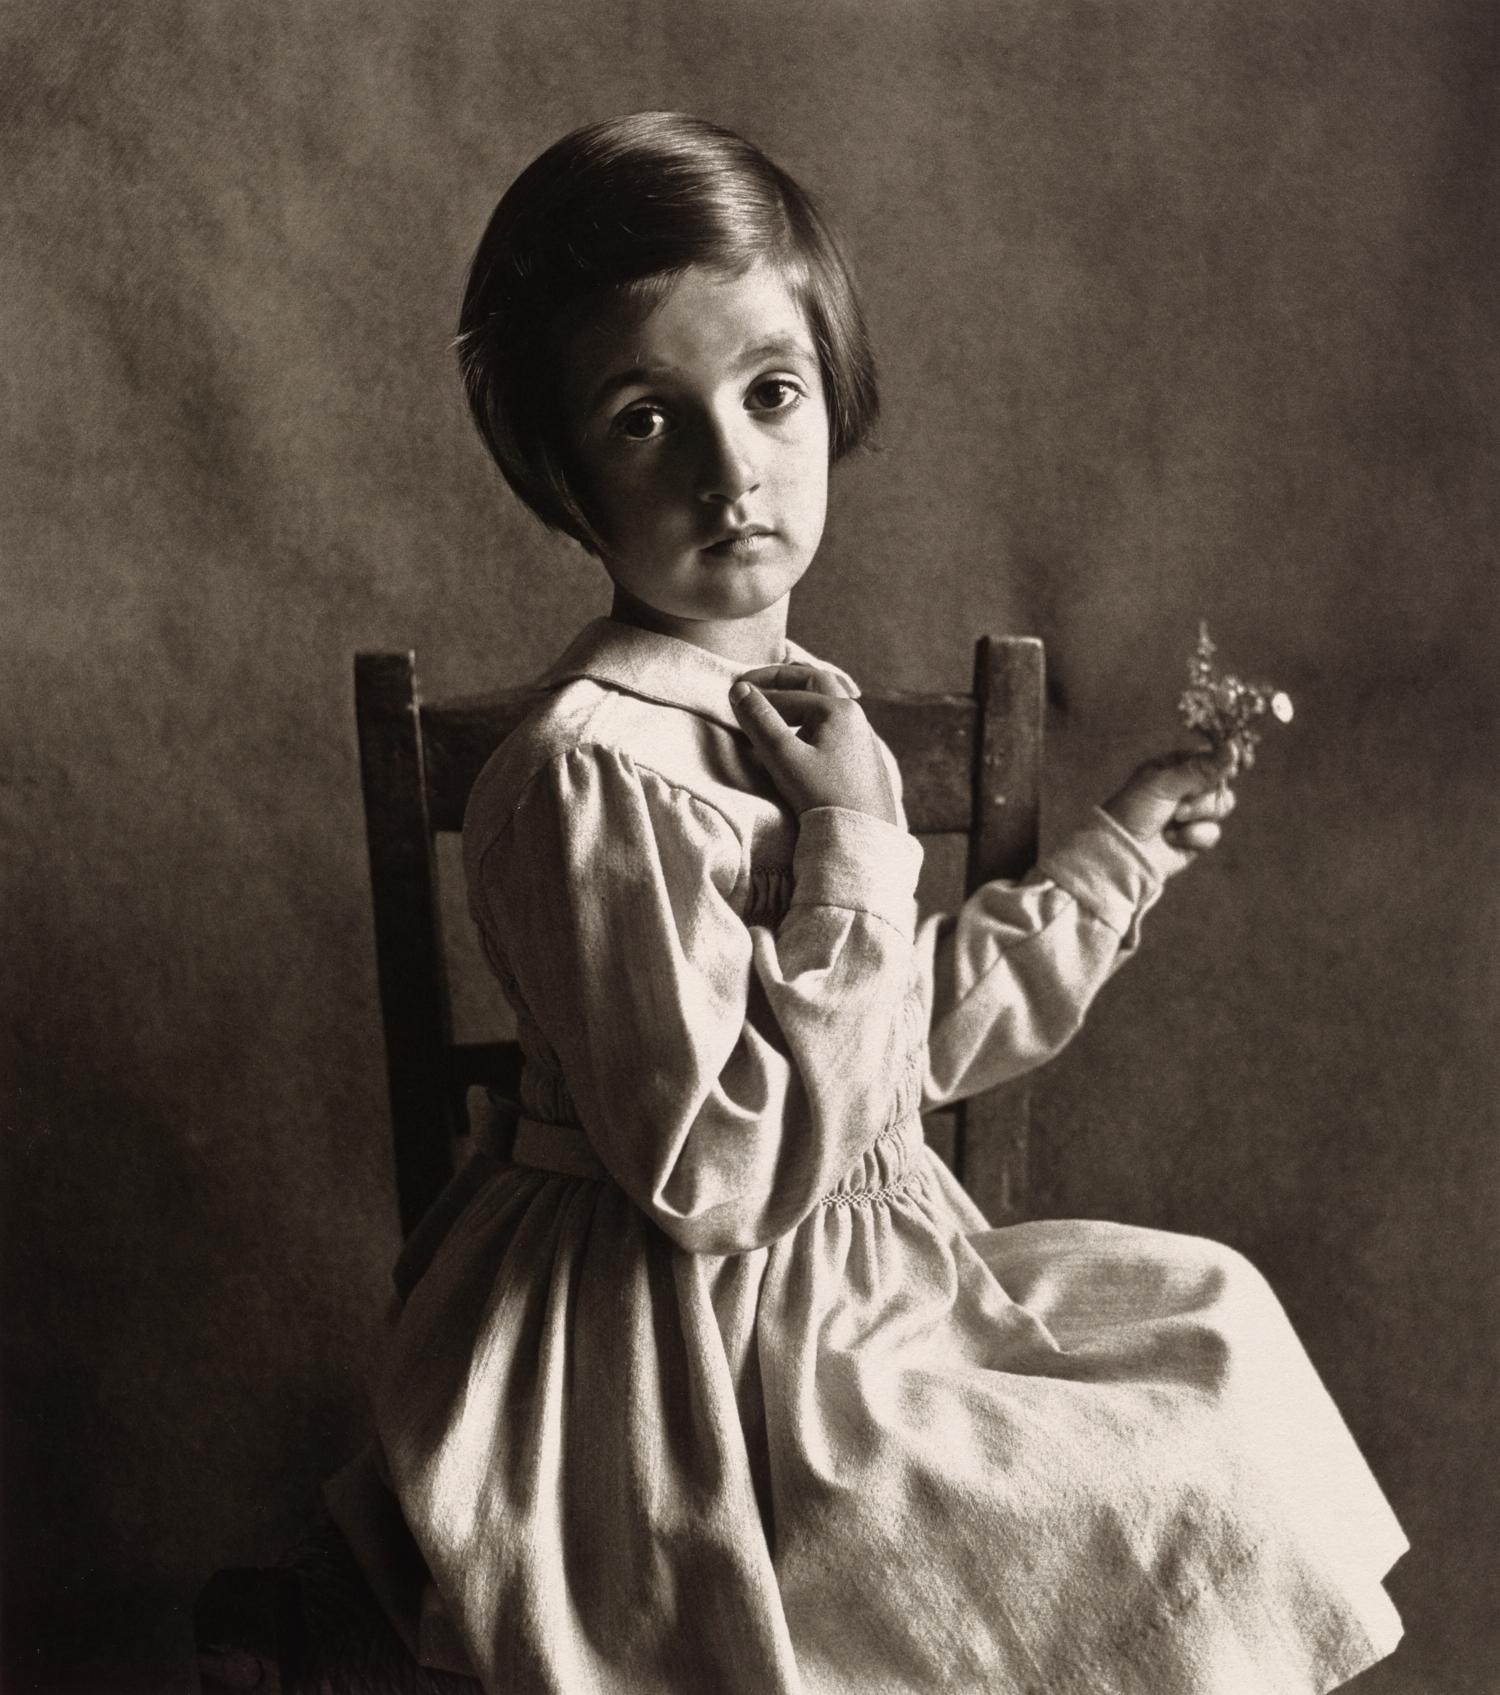 Child of Florence , 1948 Platinum-palladium print © Condé Nast